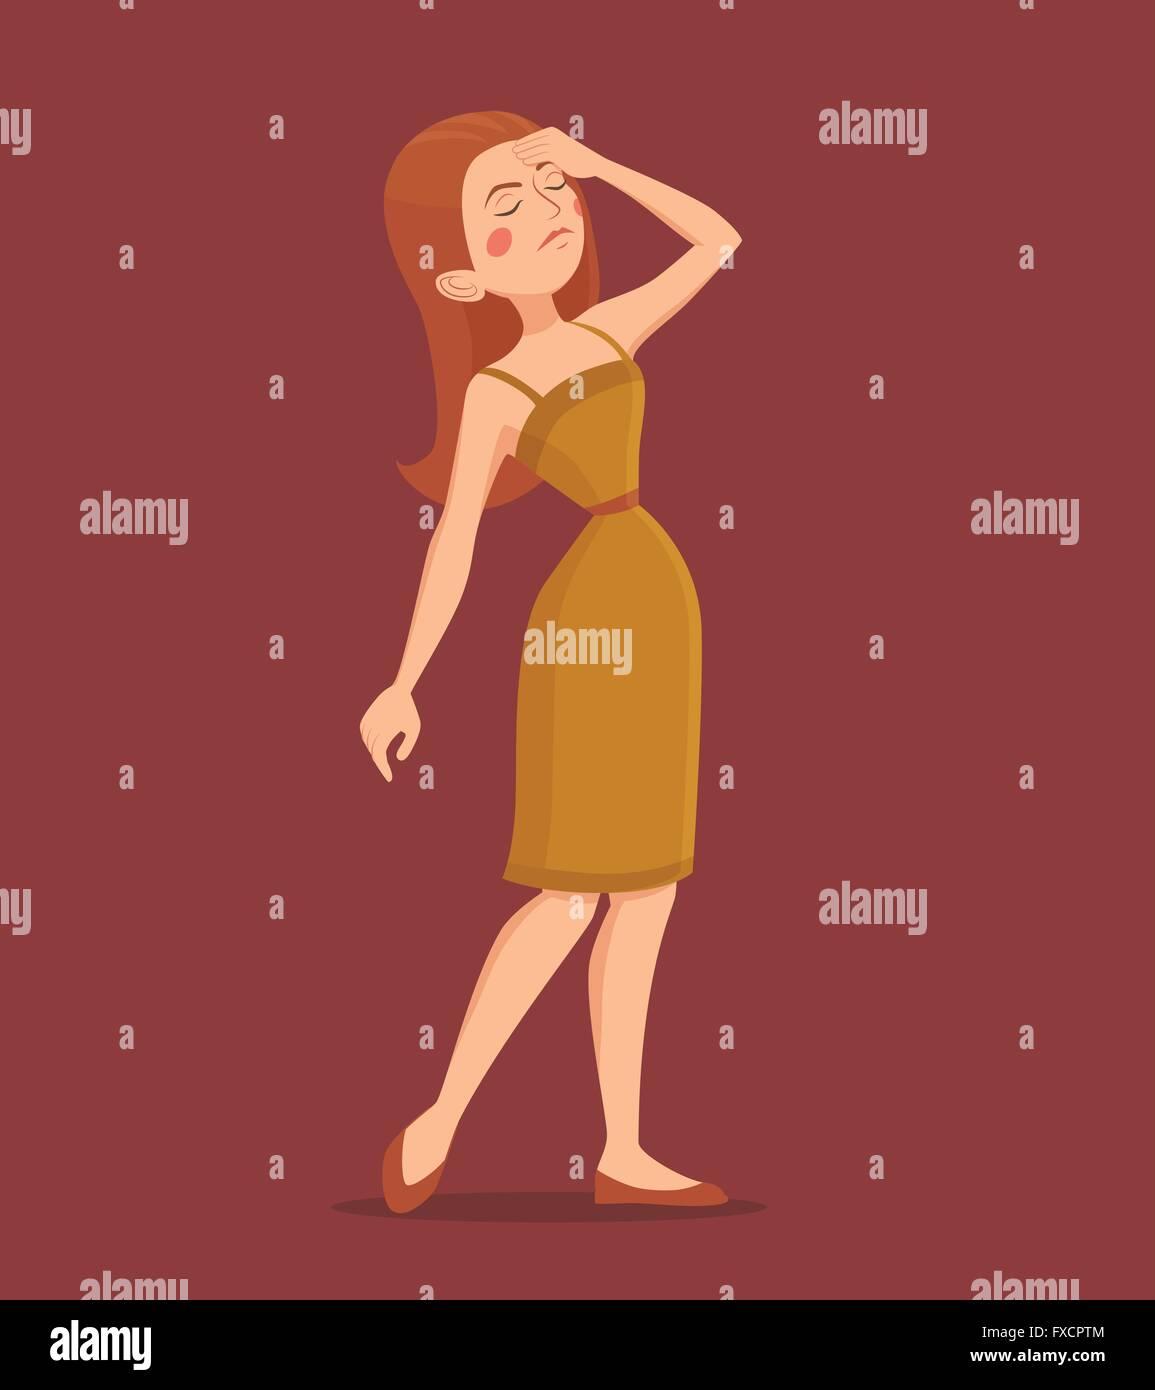 Fatigue Woman Illustration - Stock Vector